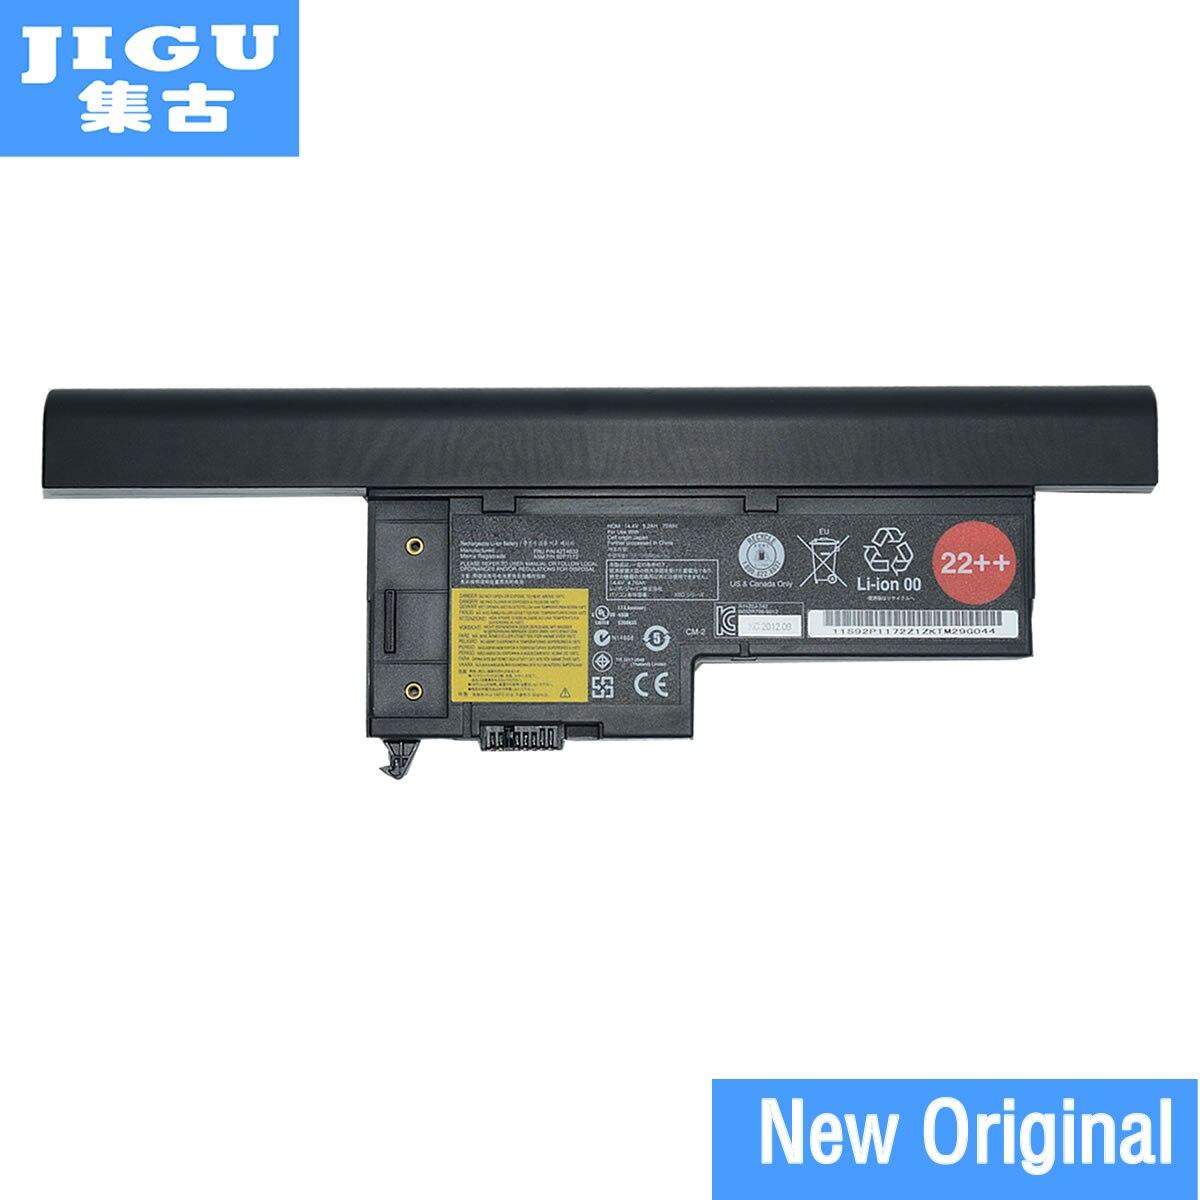 Jigu 40Y7001 40Y7003 42T4630 42T4776 оригинальный ноутбук Батарея для <font><b>Lenovo</b></font> ThinkPad X60 <font><b>X61</b></font> X60S X61S 14.4 В 75WH